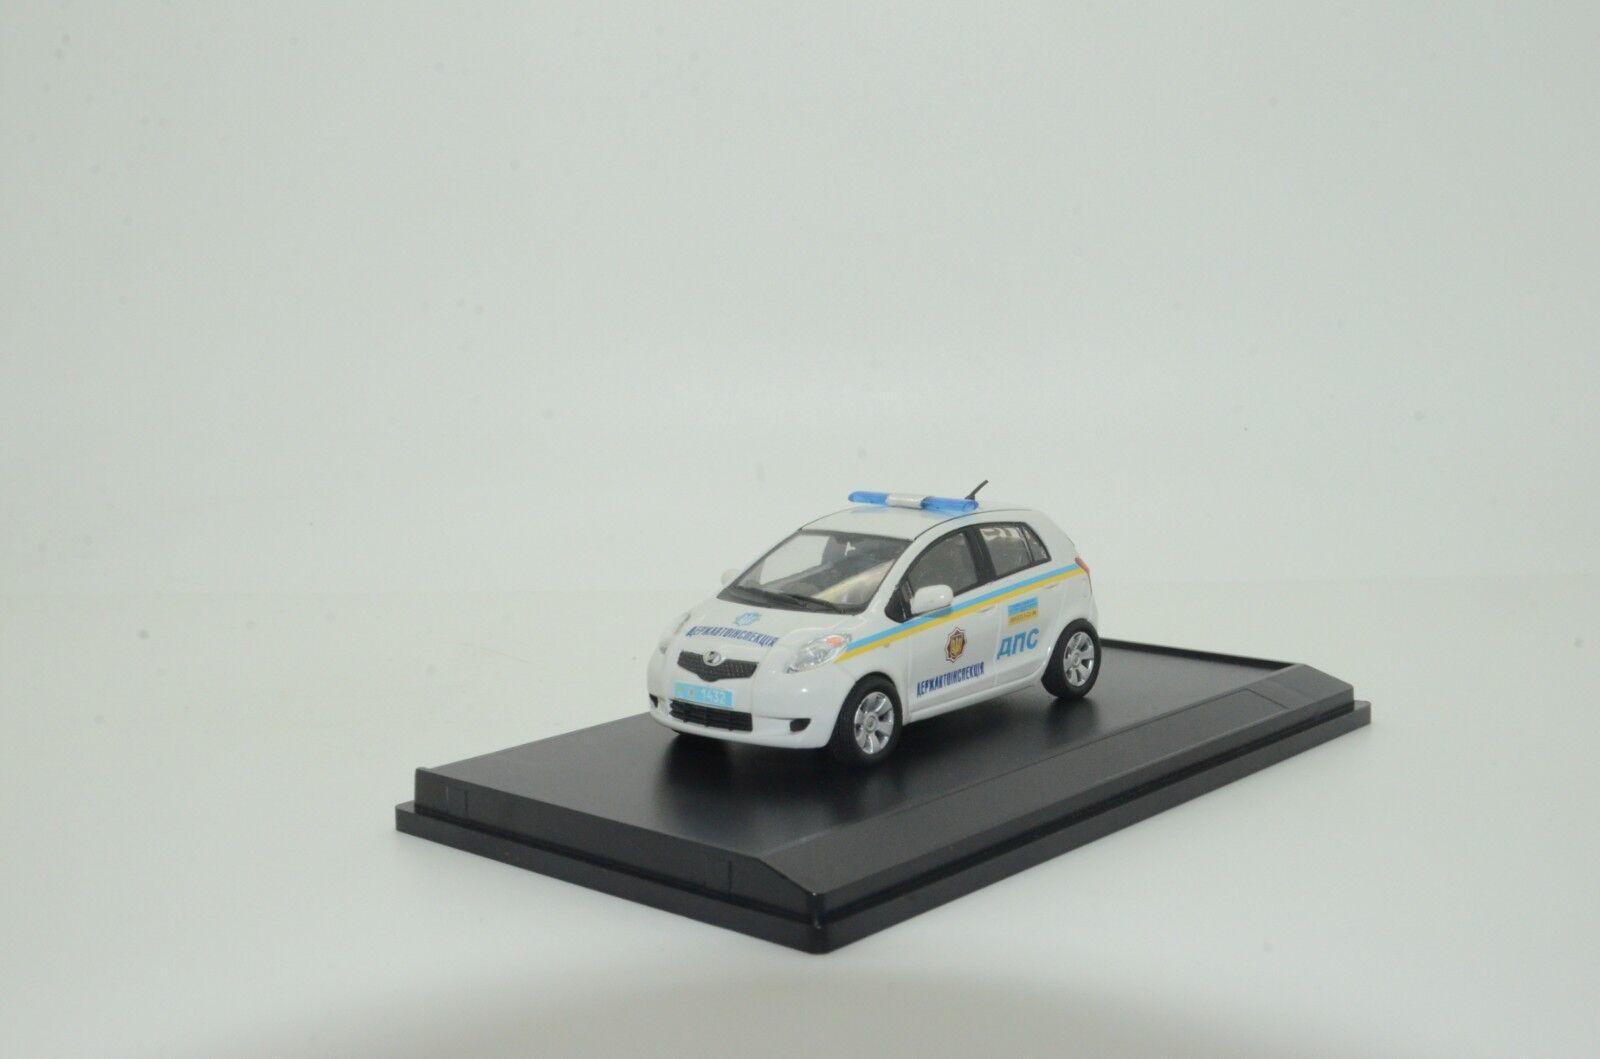 Rara Toyota Yaris Ucrania coche de policía Hecho a Medida 1 43